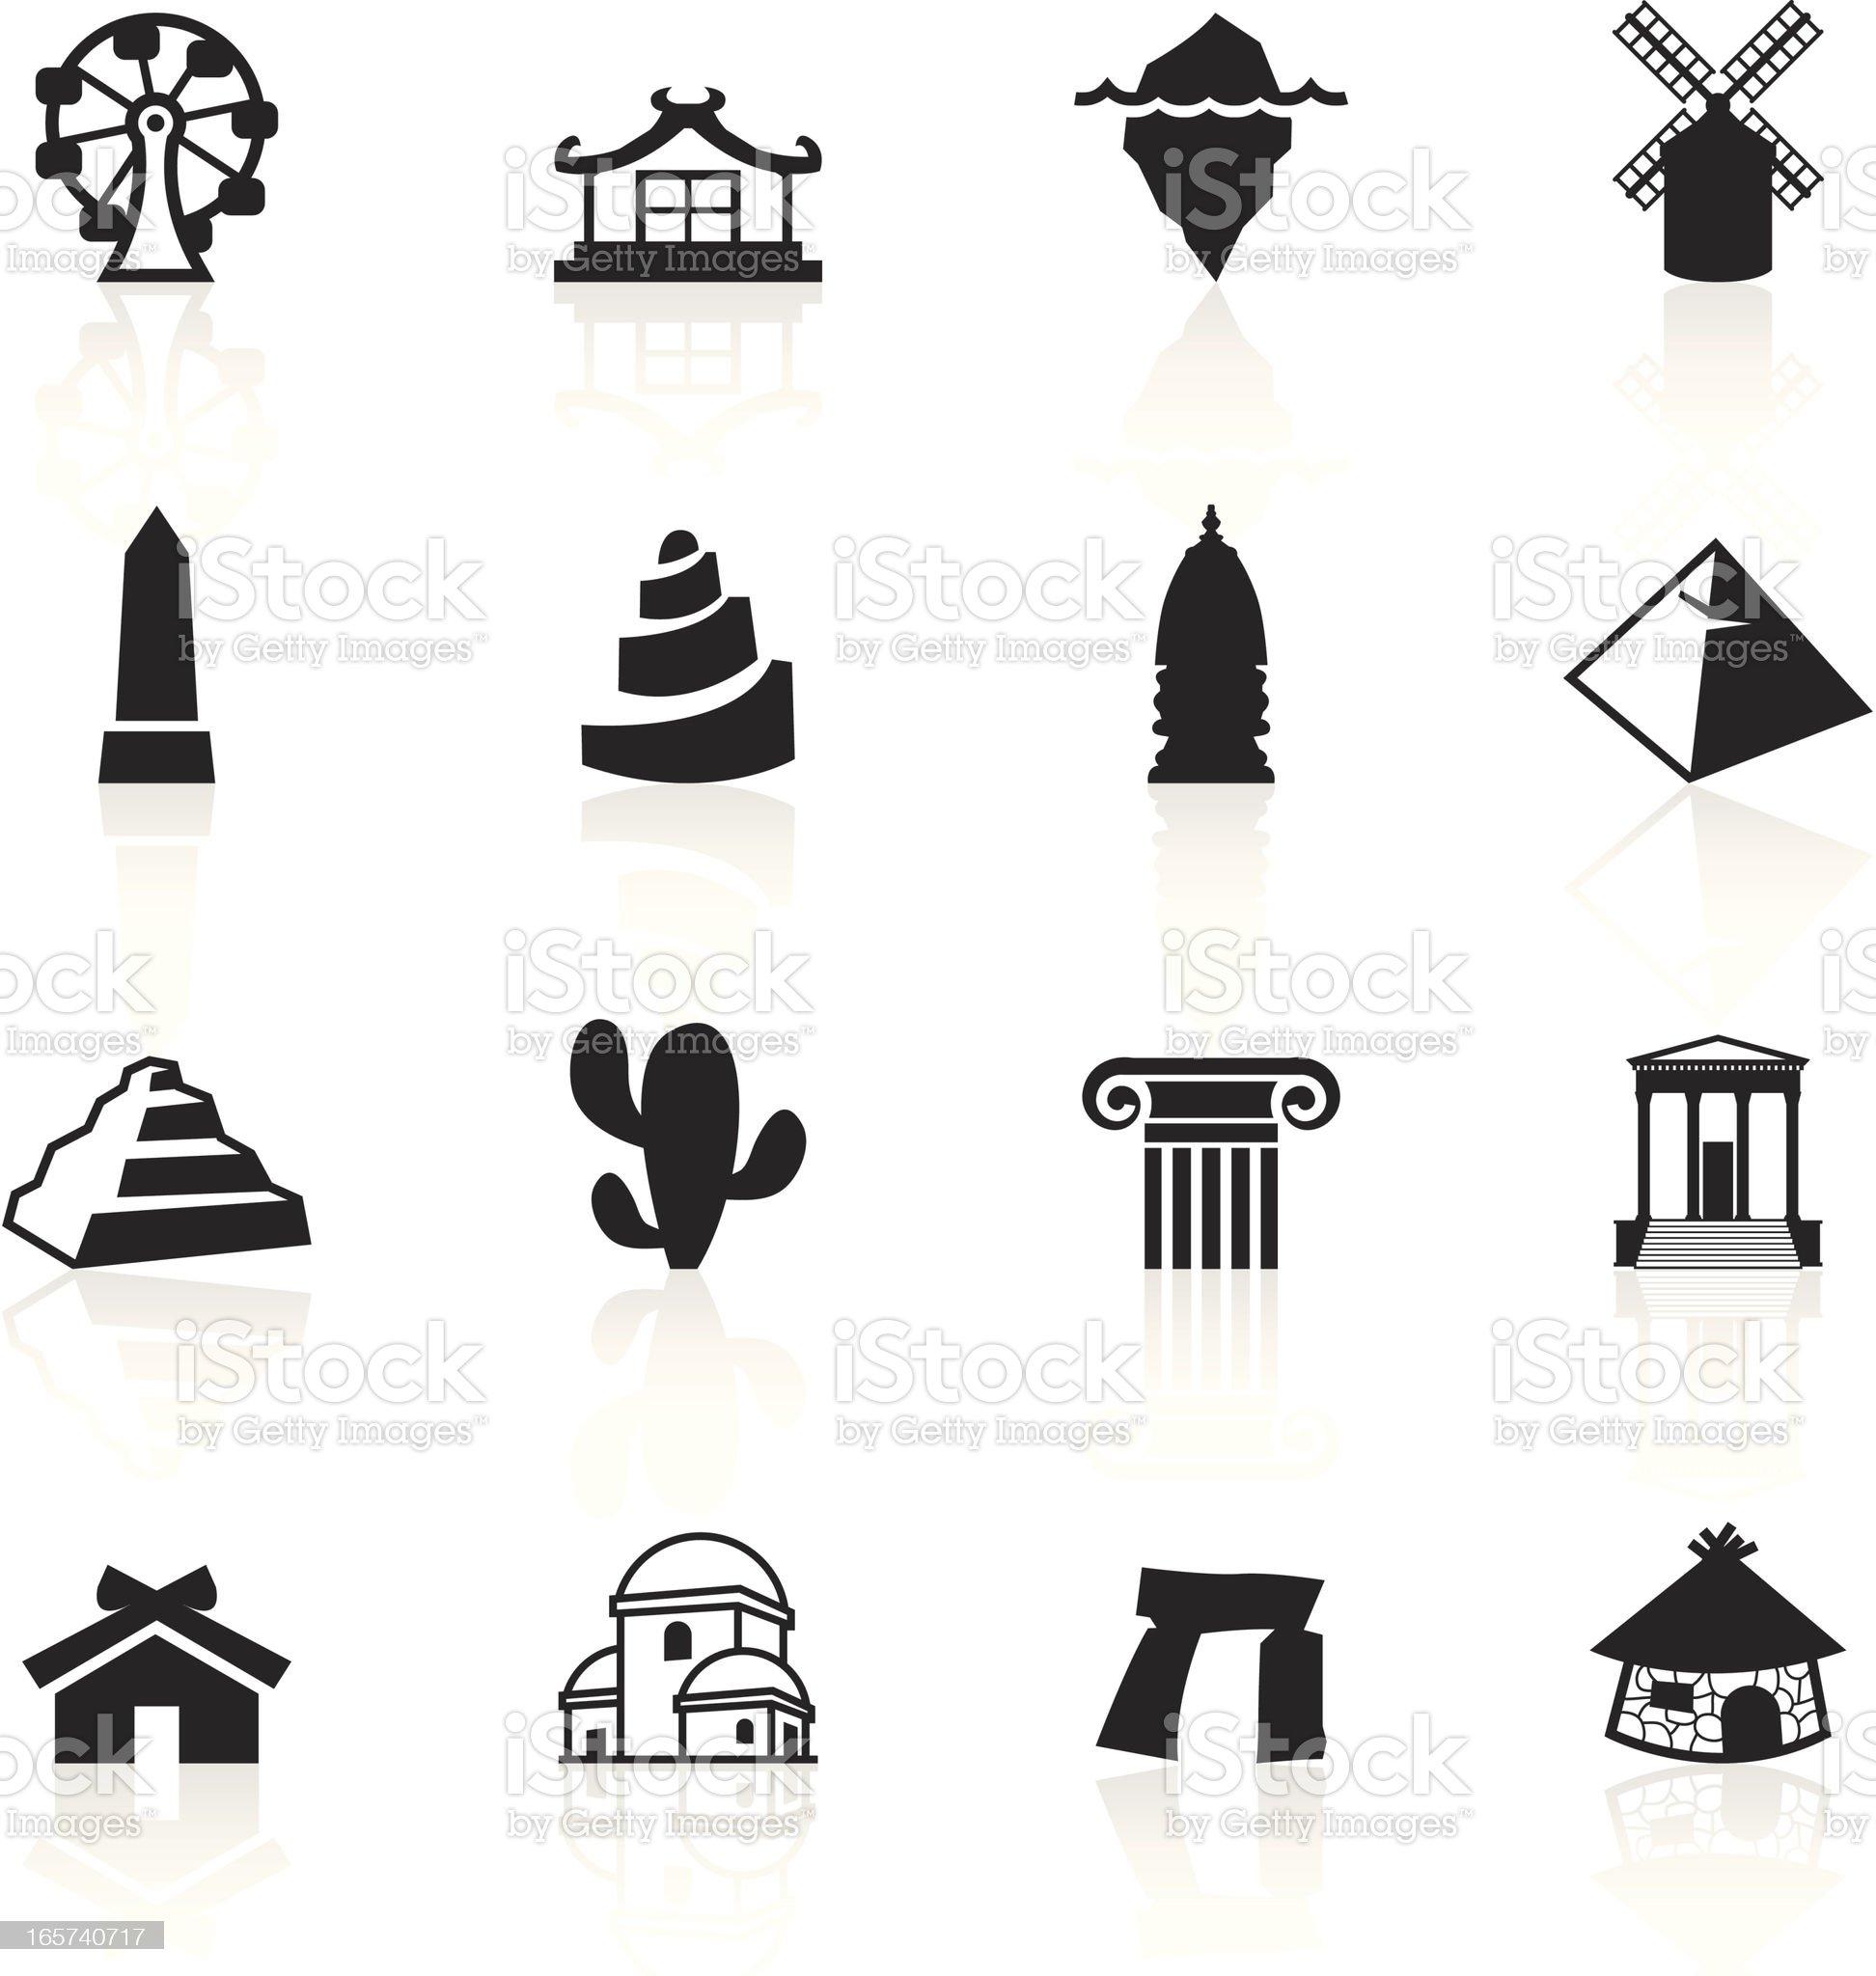 Black Symbols - Travel royalty-free stock vector art